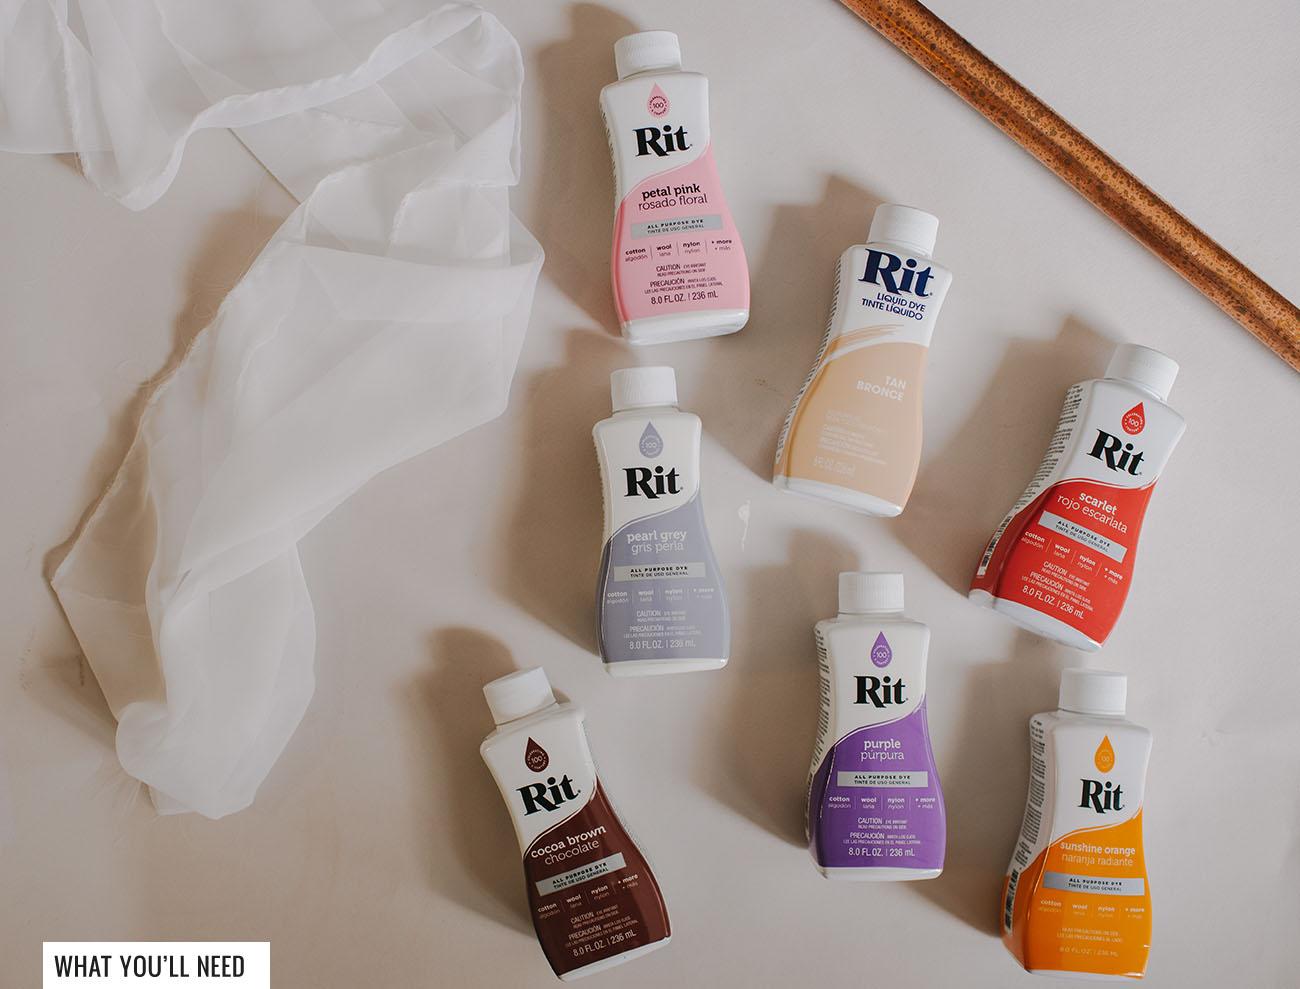 DIY RIT Dye Fabric Backdrop